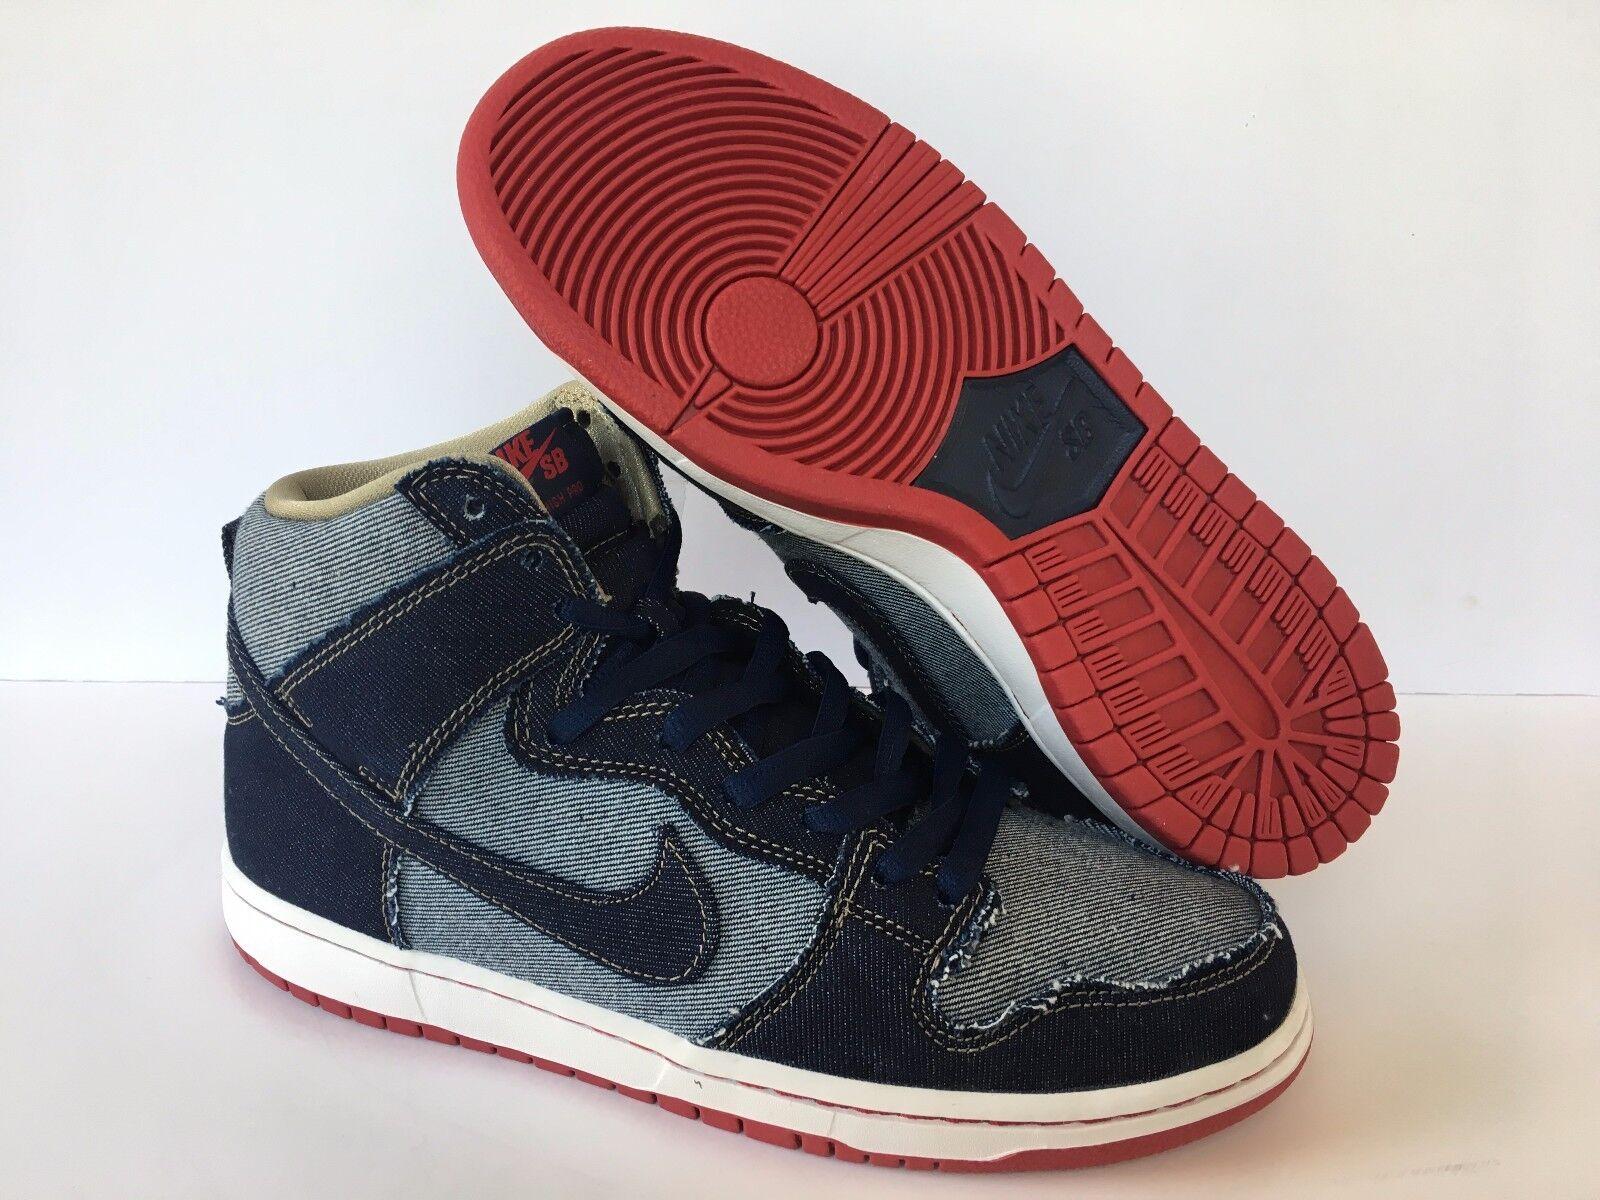 Nike SB Dunk High Denim Reese Forbes Navy Red White  881758-441 Sz 6